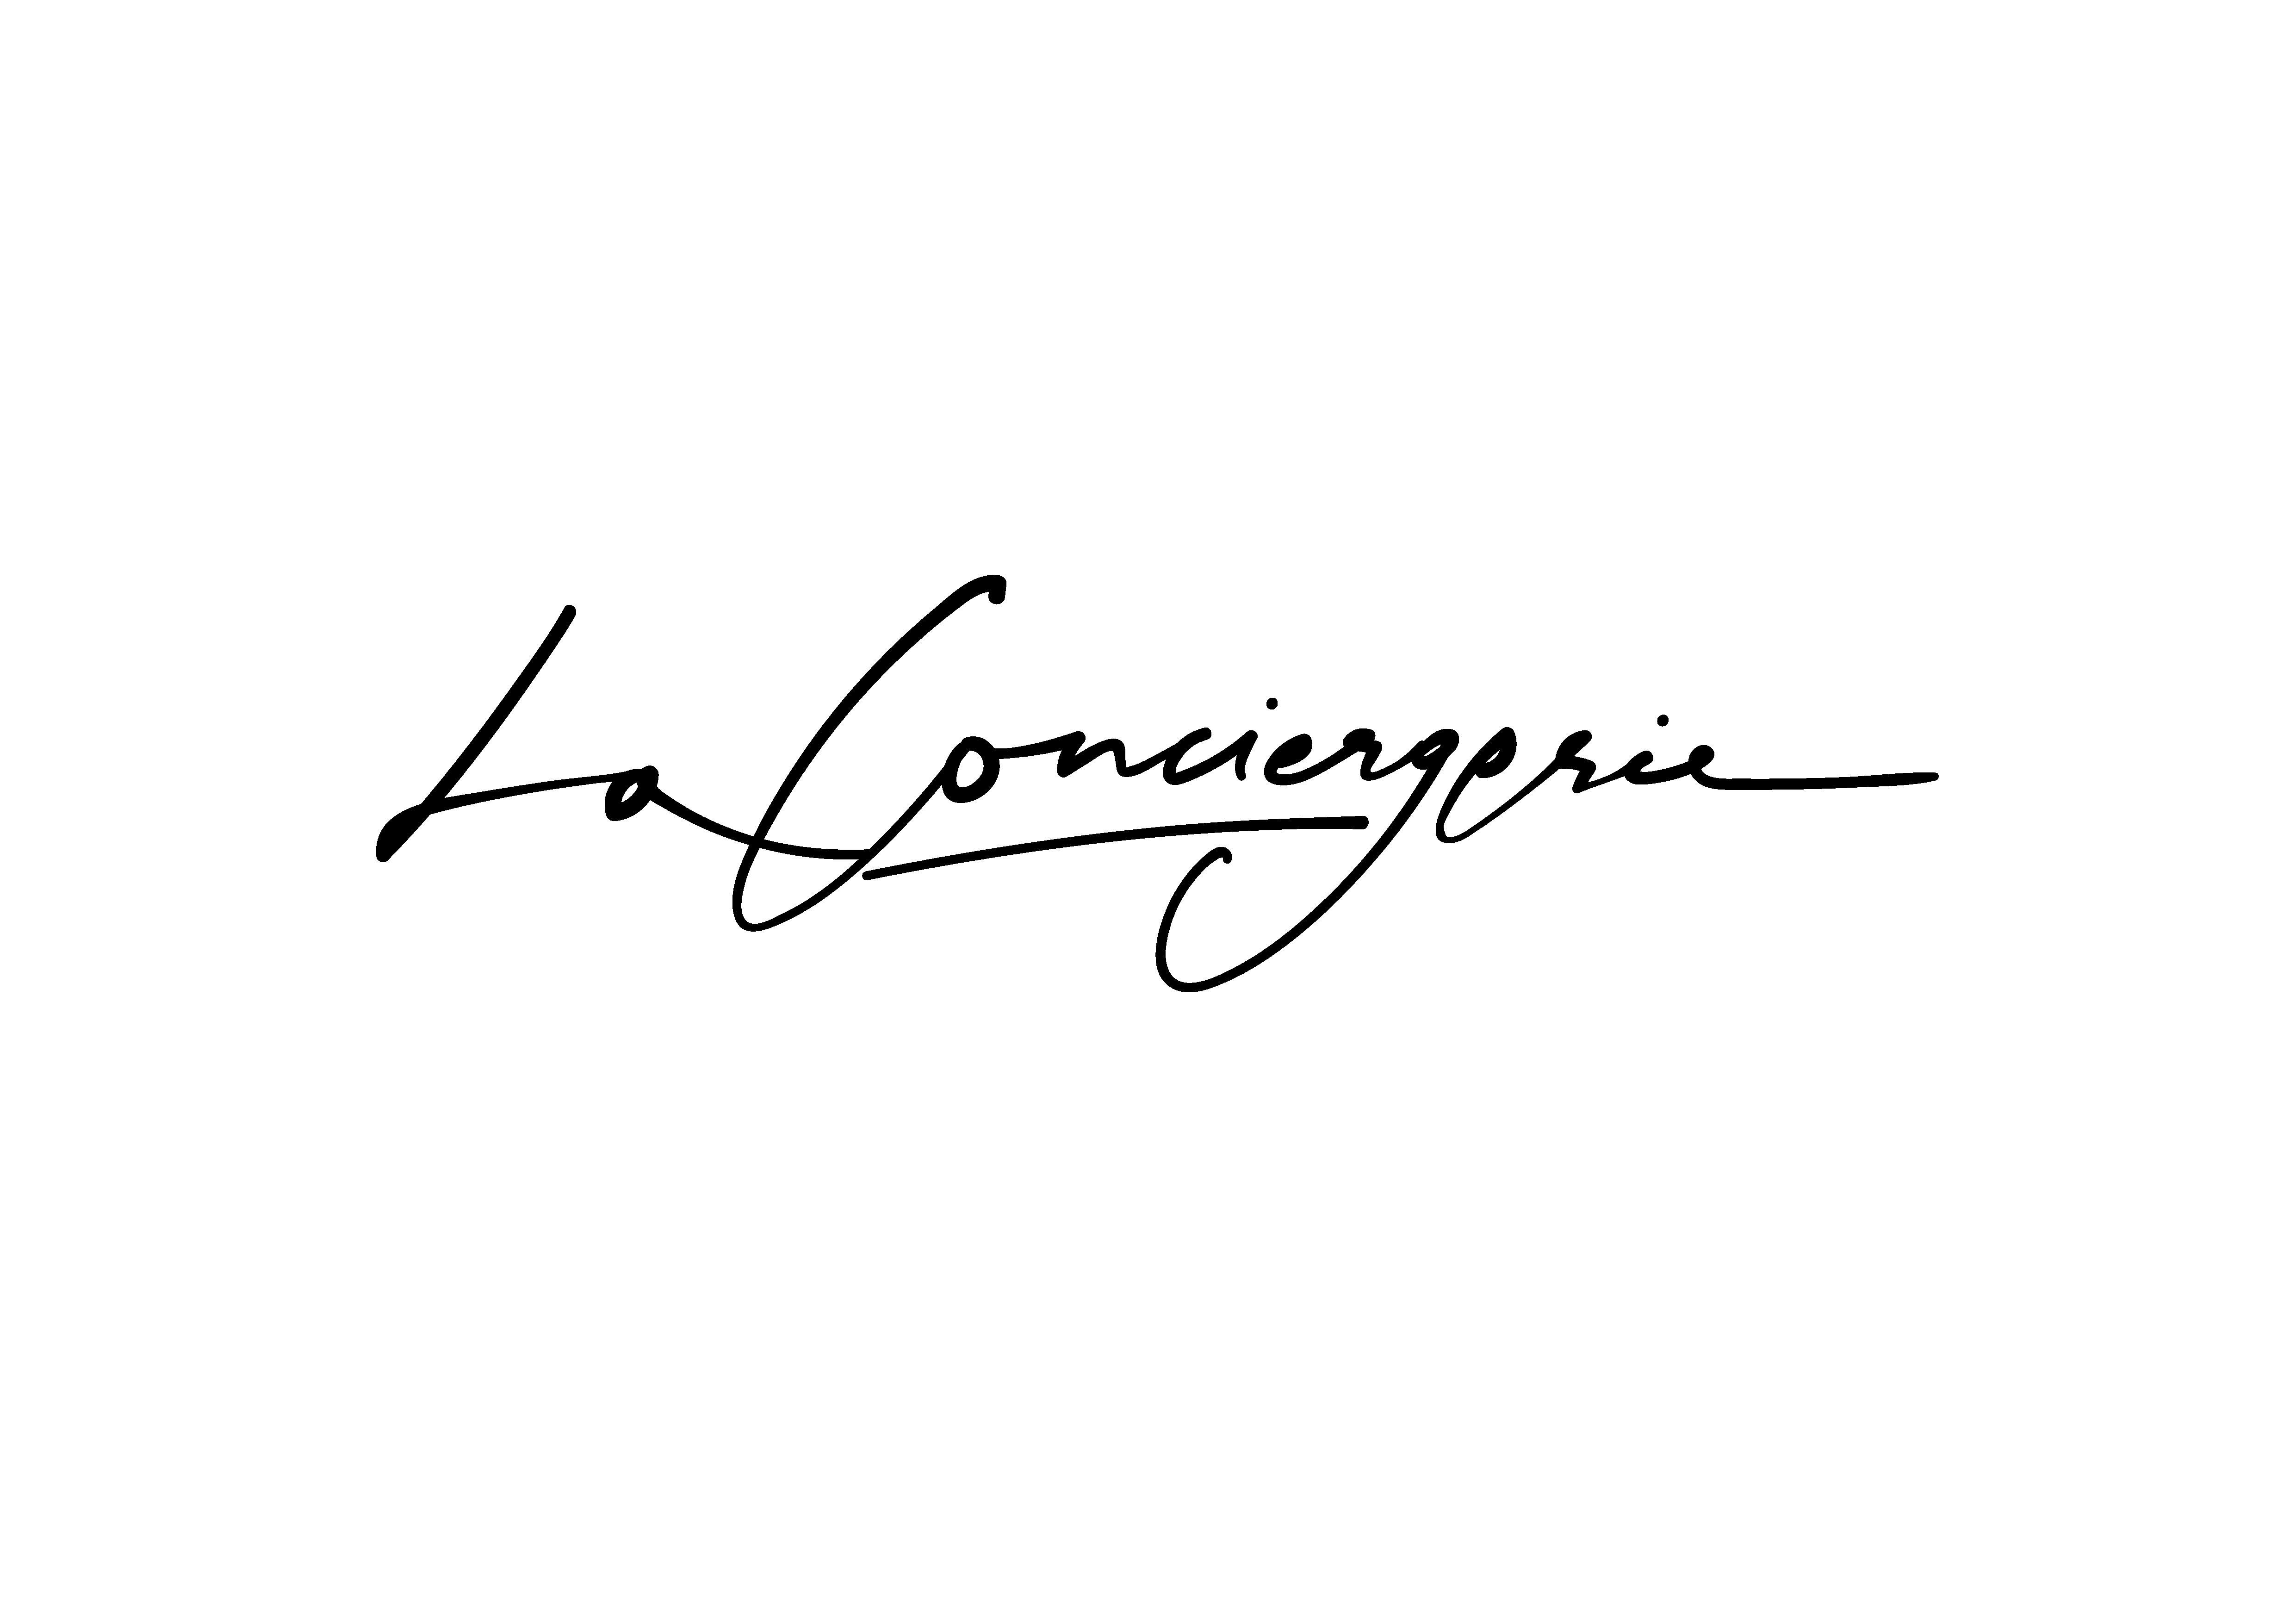 la Concergerie Mod 1_Version 1